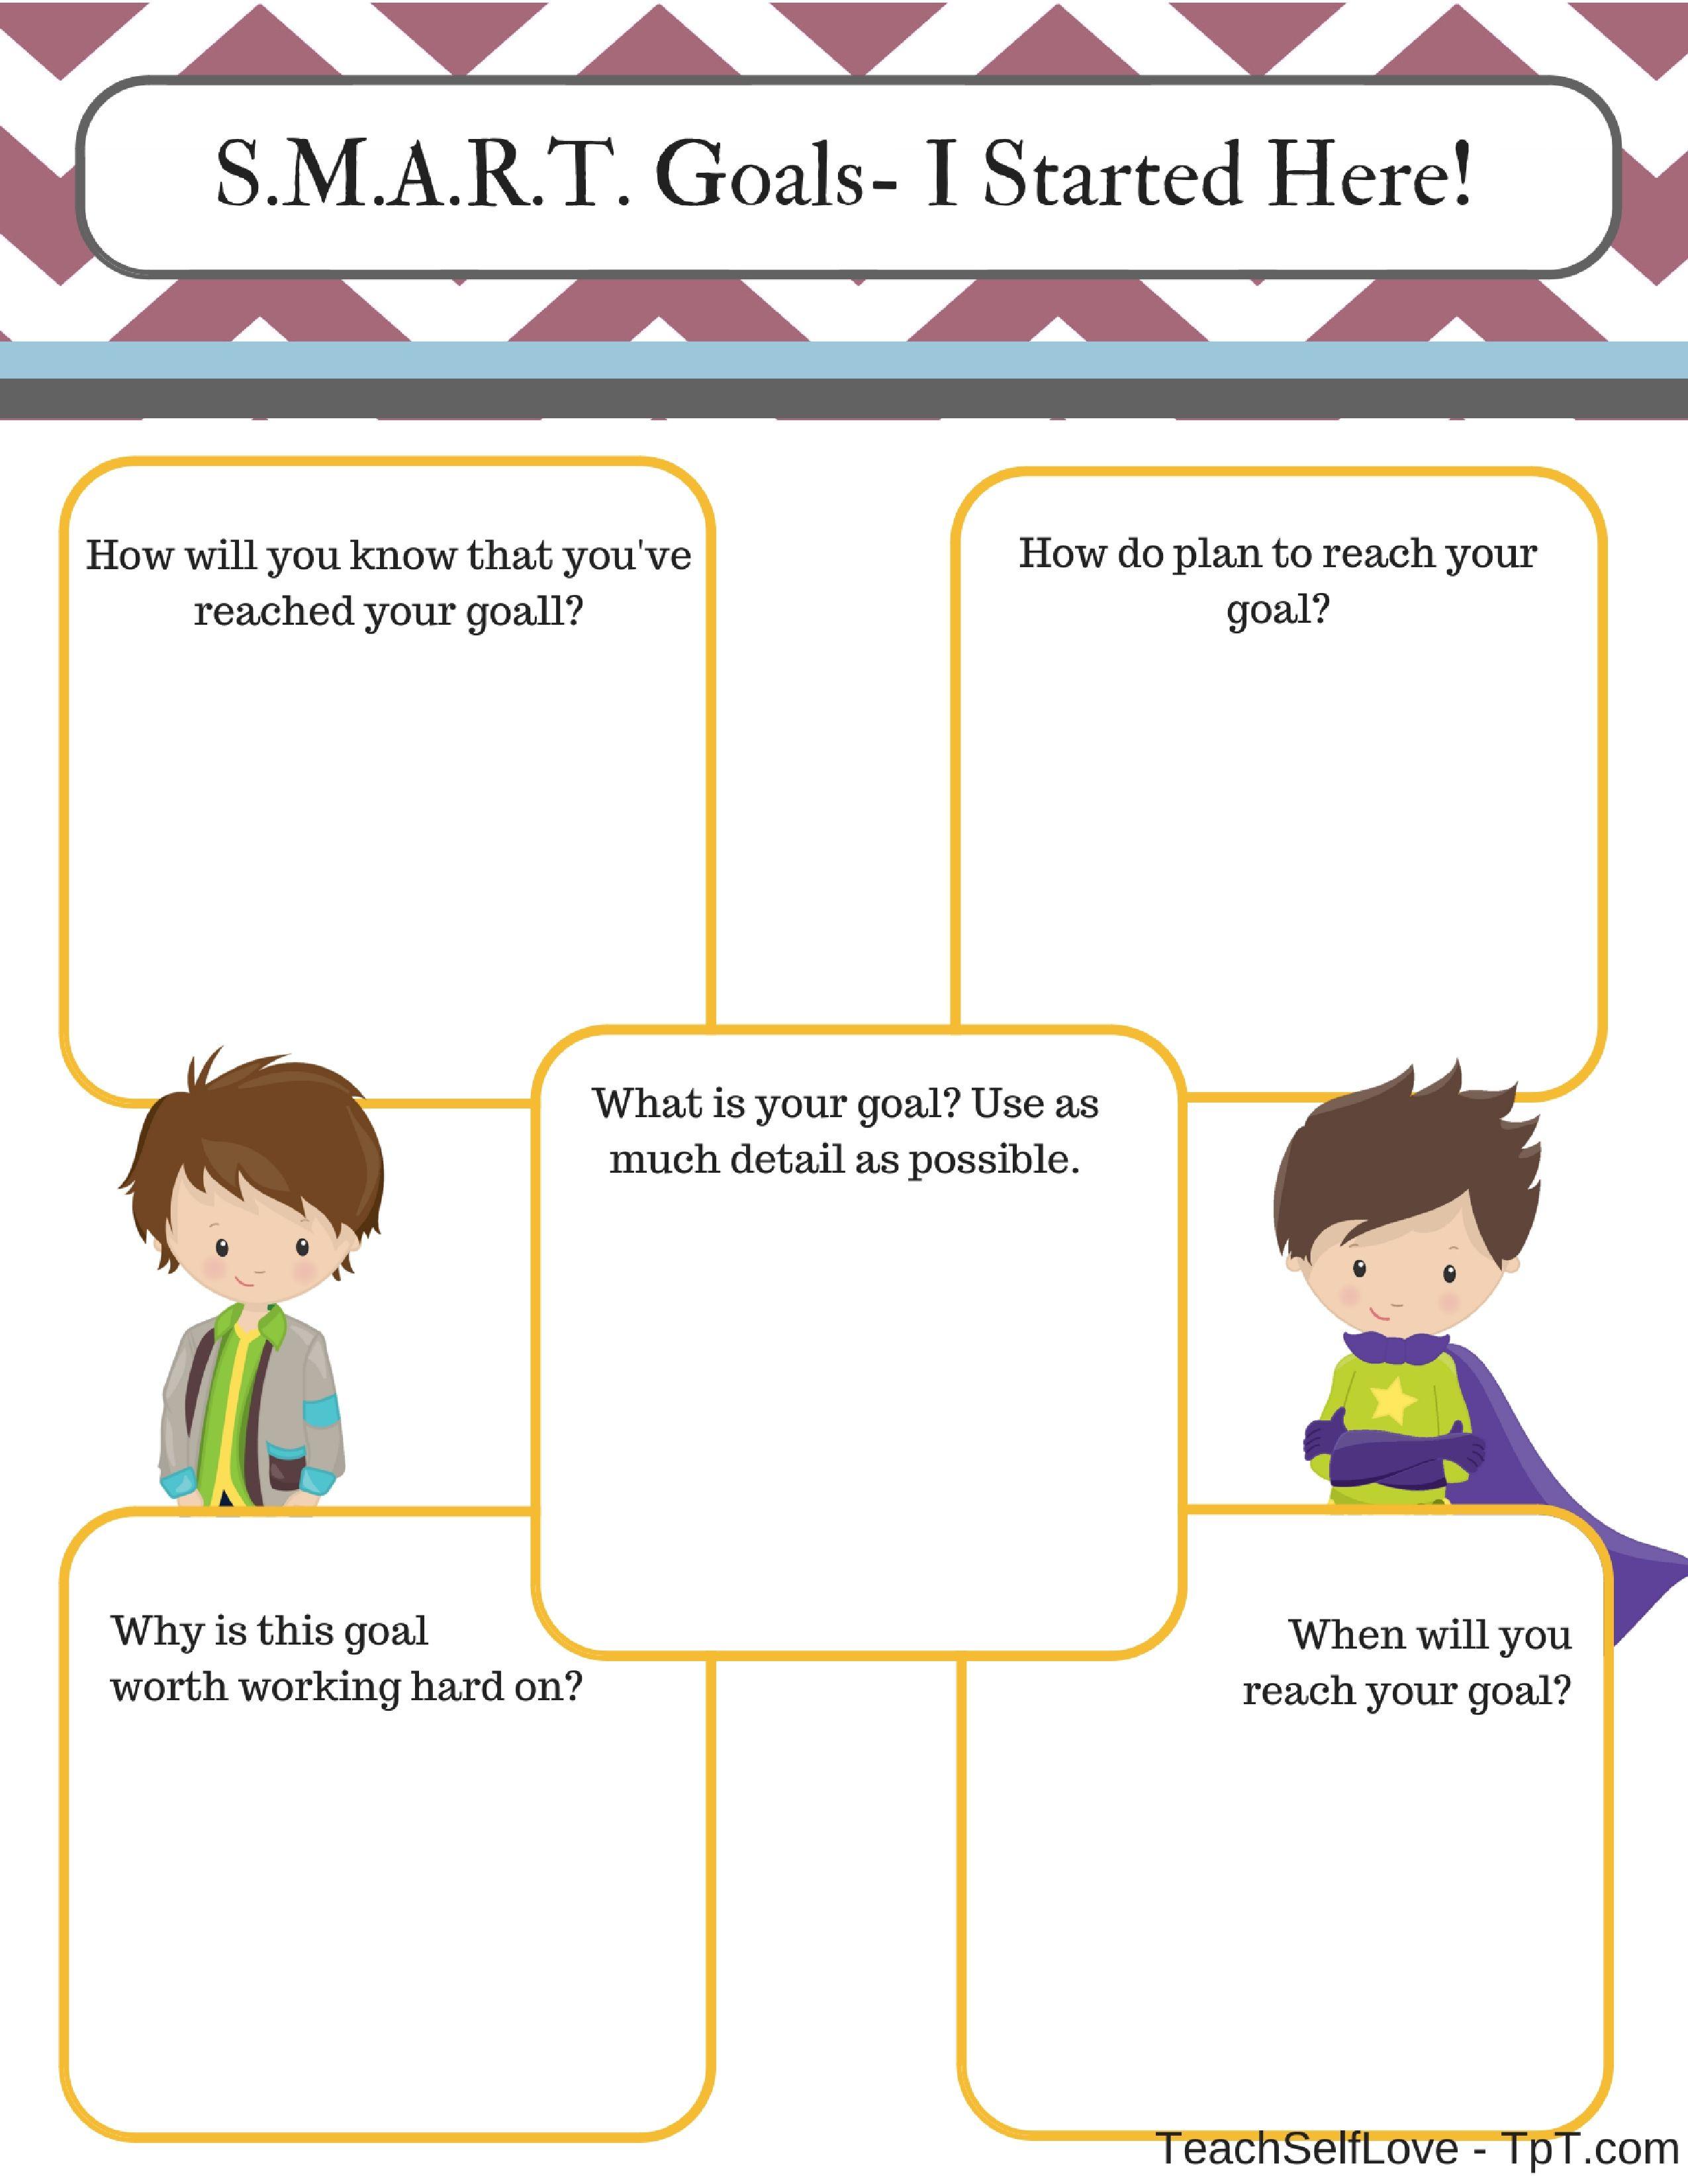 SMART Goals - Comparison Worksheets | For Teachers, By Teachers ...